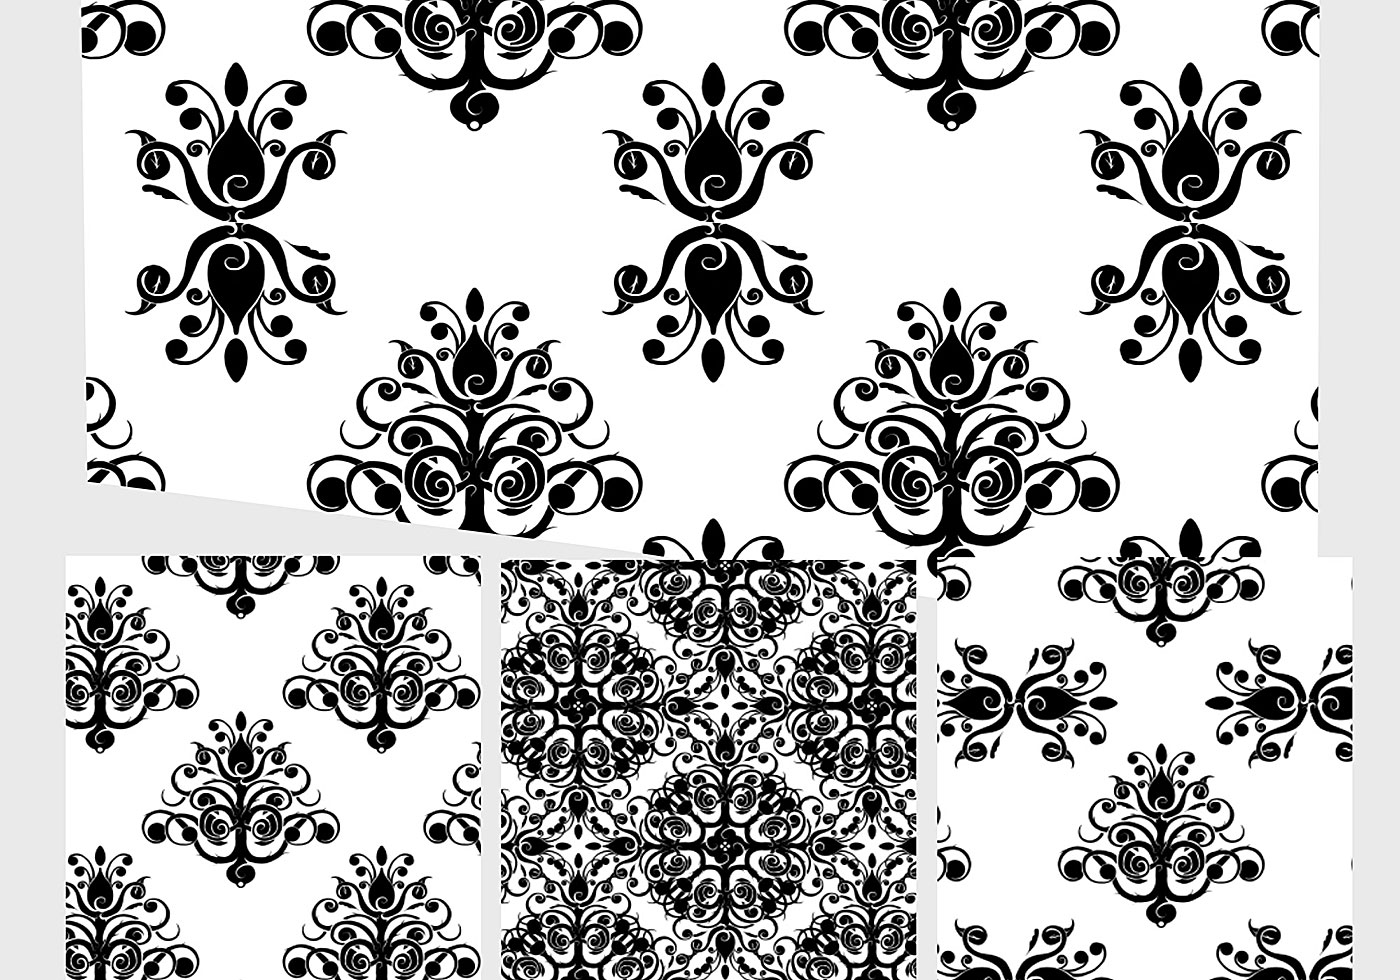 Wallpaper Black And White Damask Baroque Patterns 5 Free Photoshop Patterns At Brusheezy